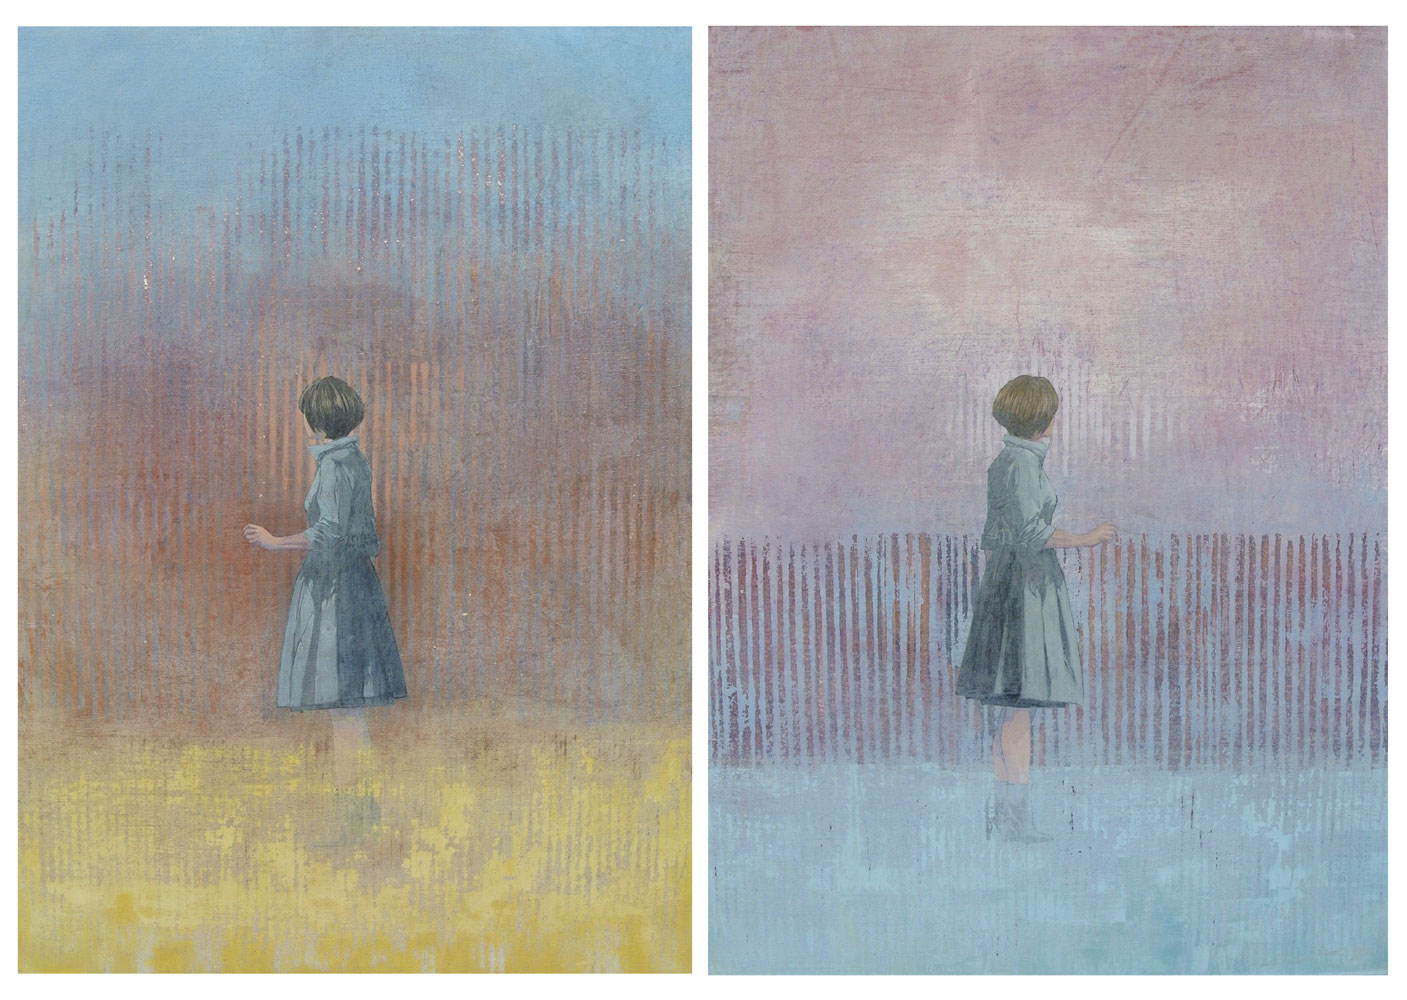 INFANTE FEDERICO, A recurring dream II, 2017, acrilico su tela, 2 pz., 78 x 114 cm